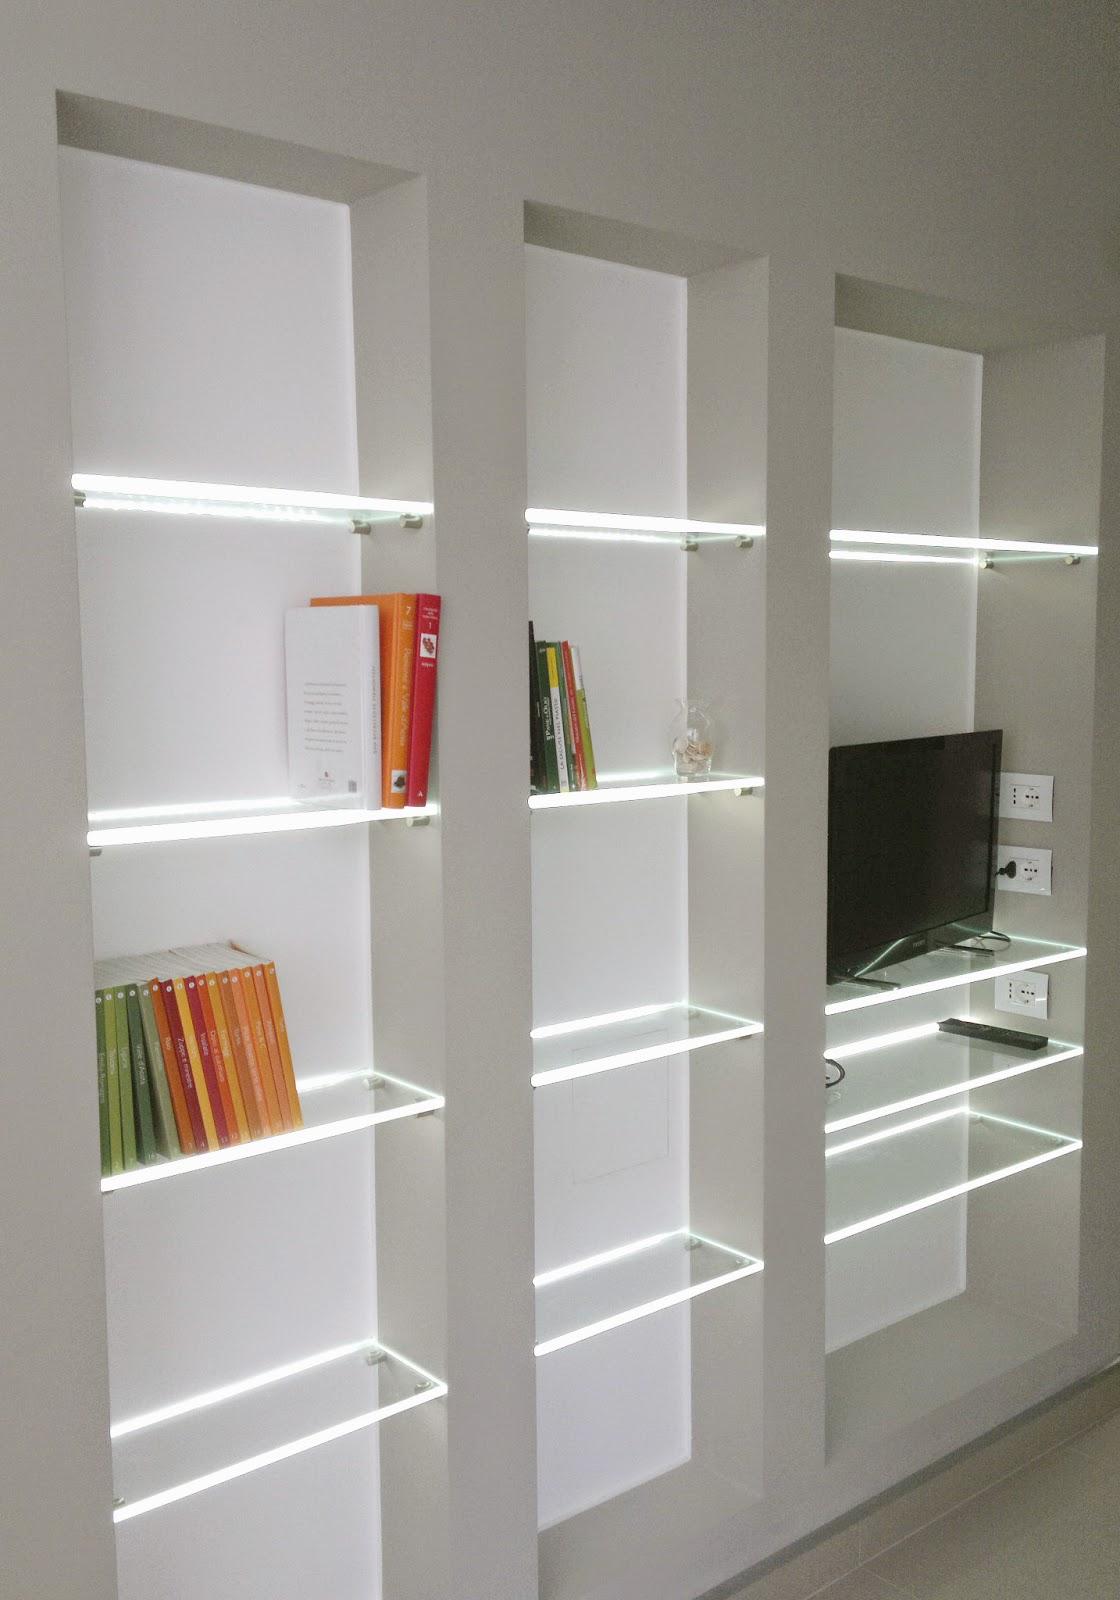 Illuminazione led casa ottobre 2014 - Lampadari a led per casa ...